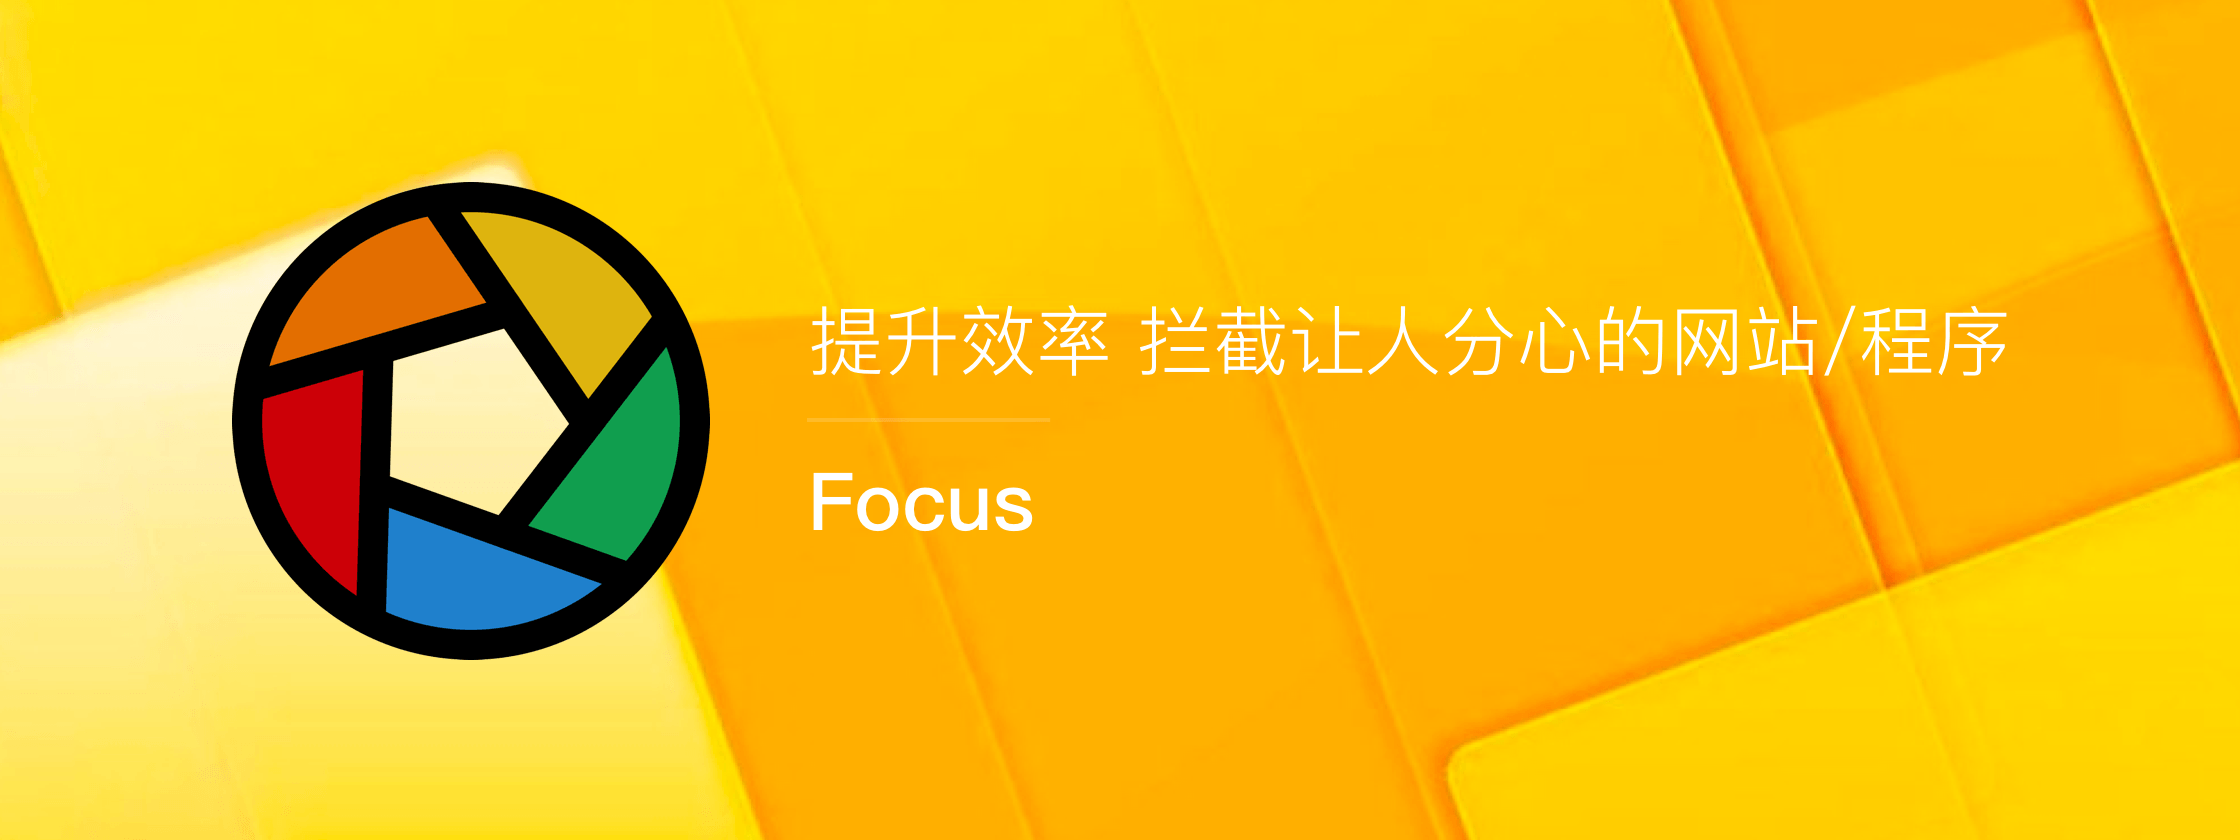 Focus – 提升效率 拦截让人分心的网站/程序